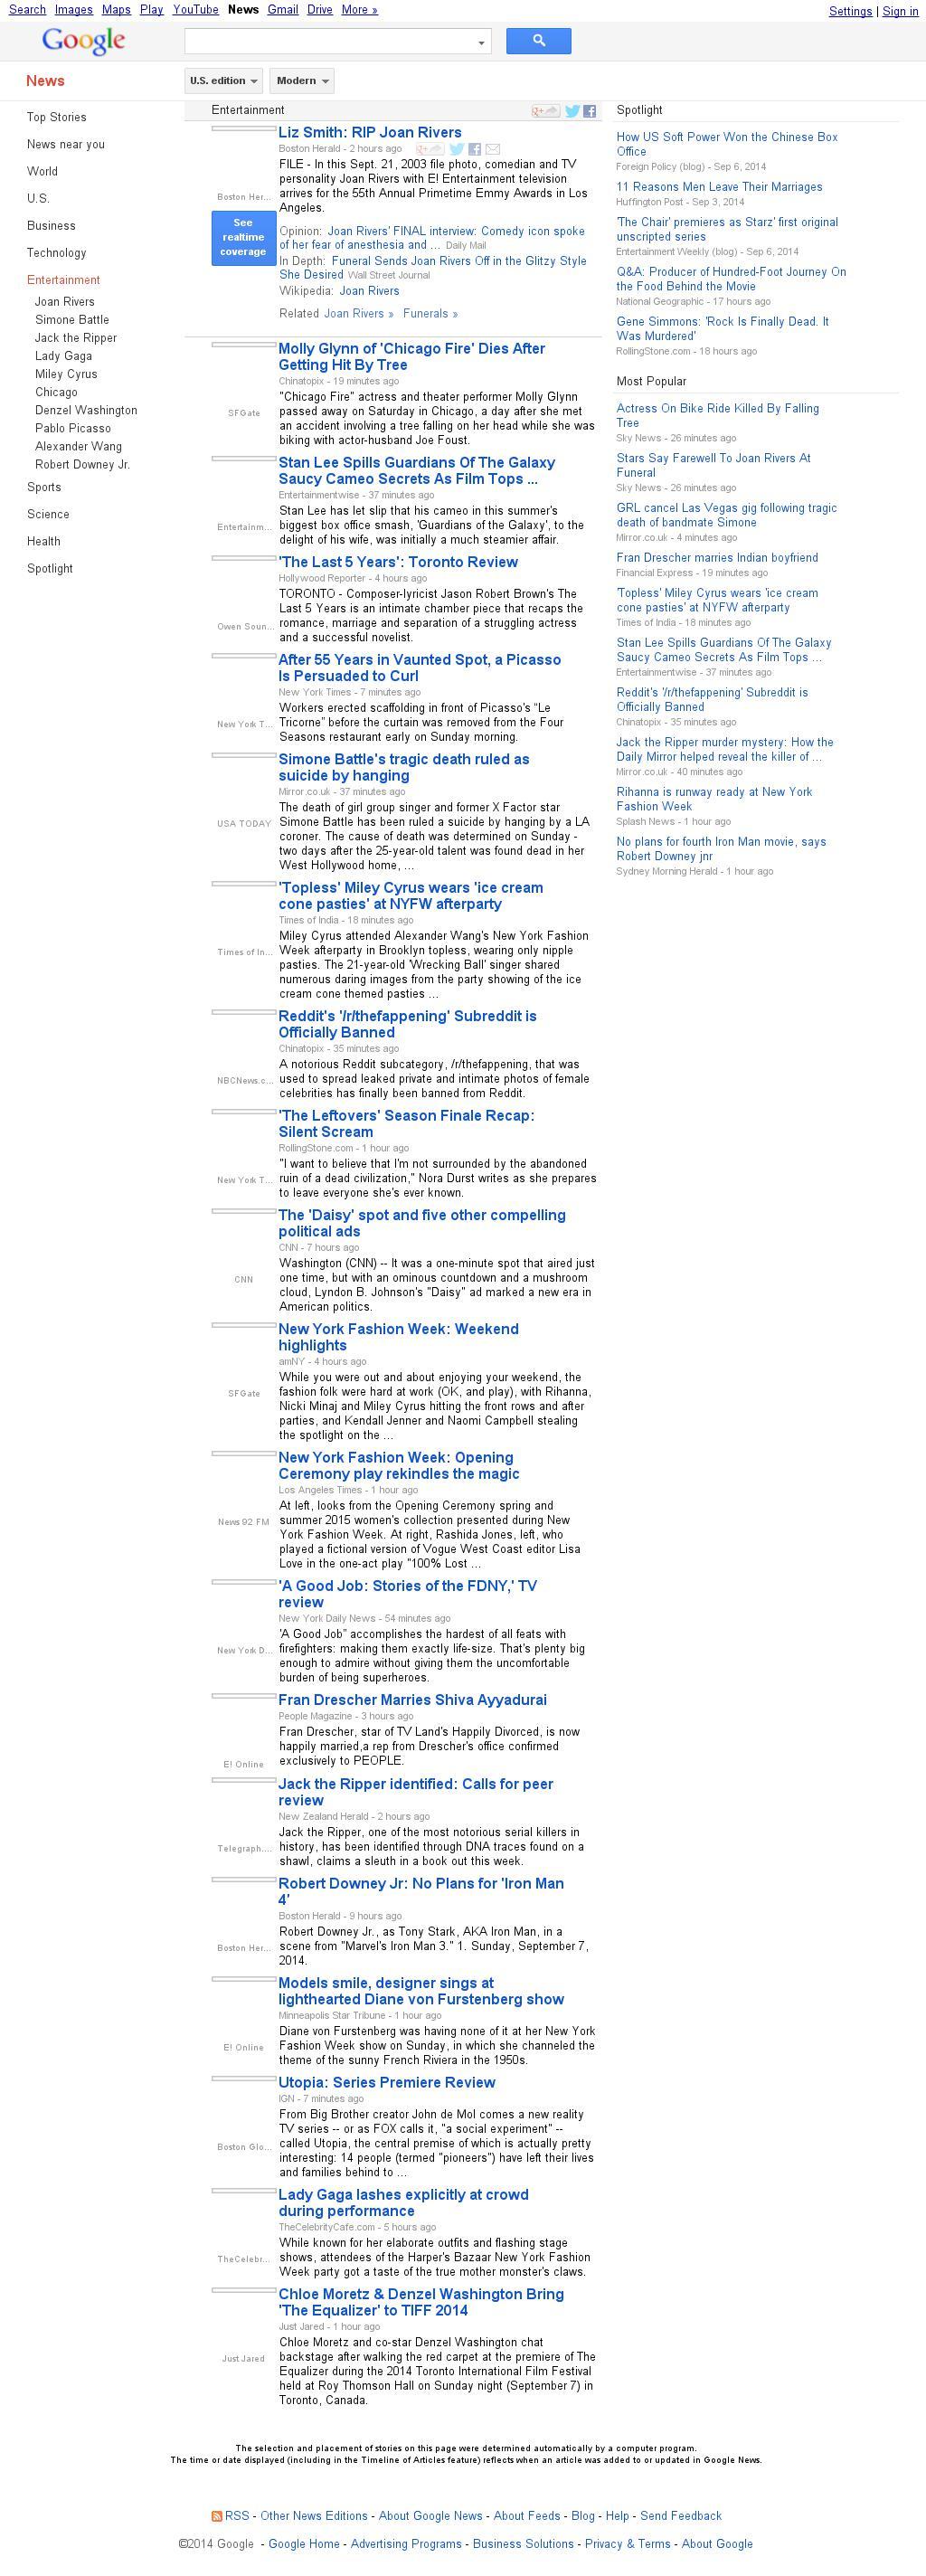 Google News: Entertainment at Monday Sept. 8, 2014, 7:06 a.m. UTC